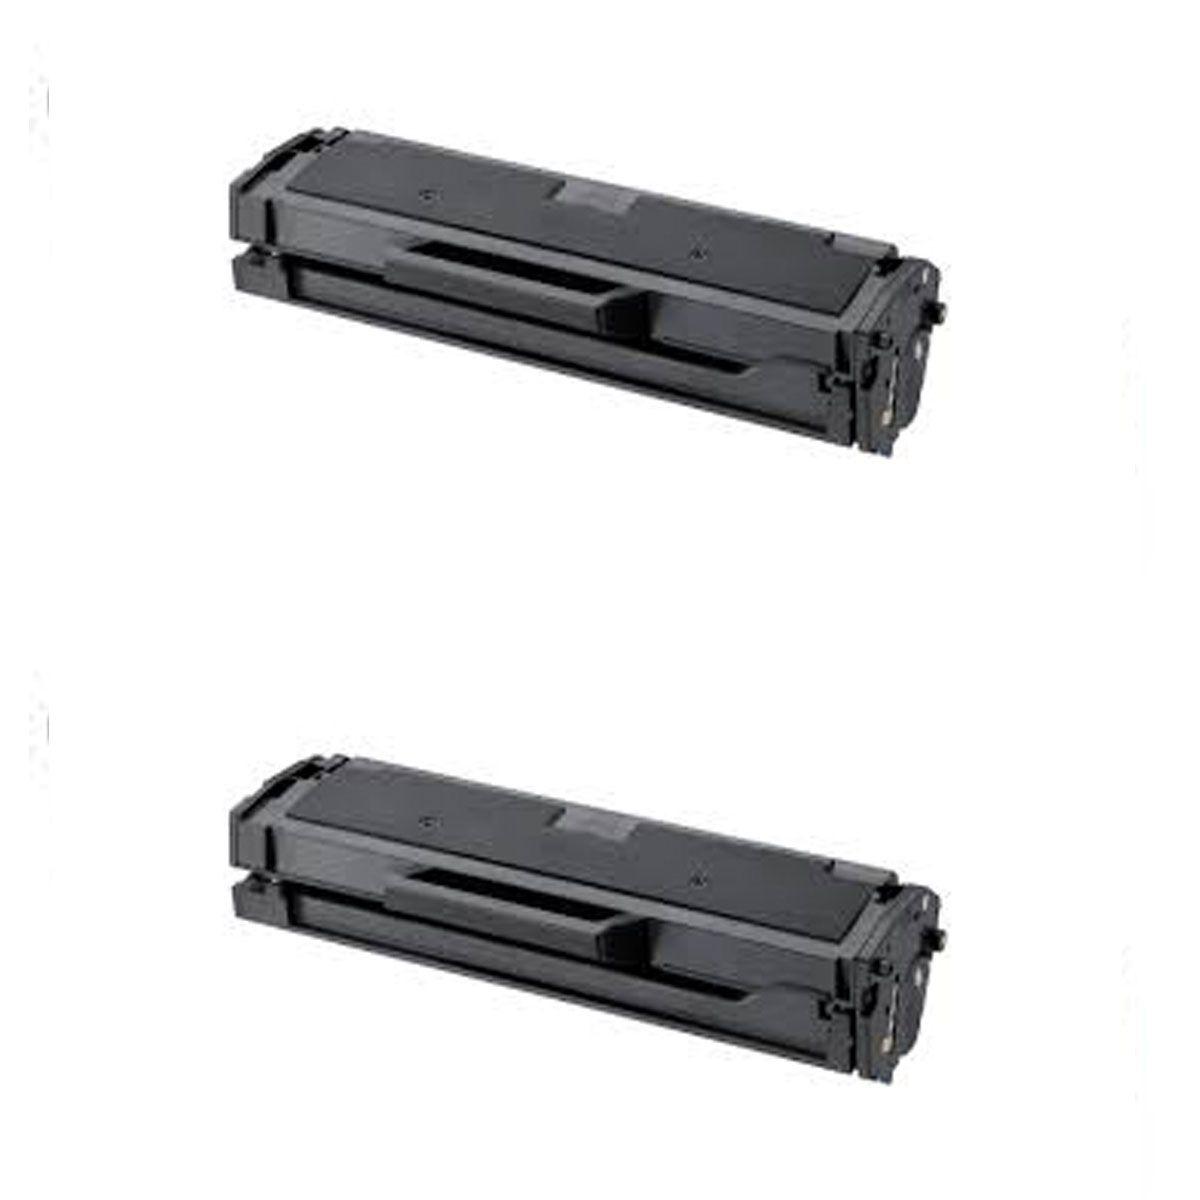 kit 2 Toner Samsung D111S D111 111 - M2020 M2070 - Compativel N3-9CZT-Q4RL -